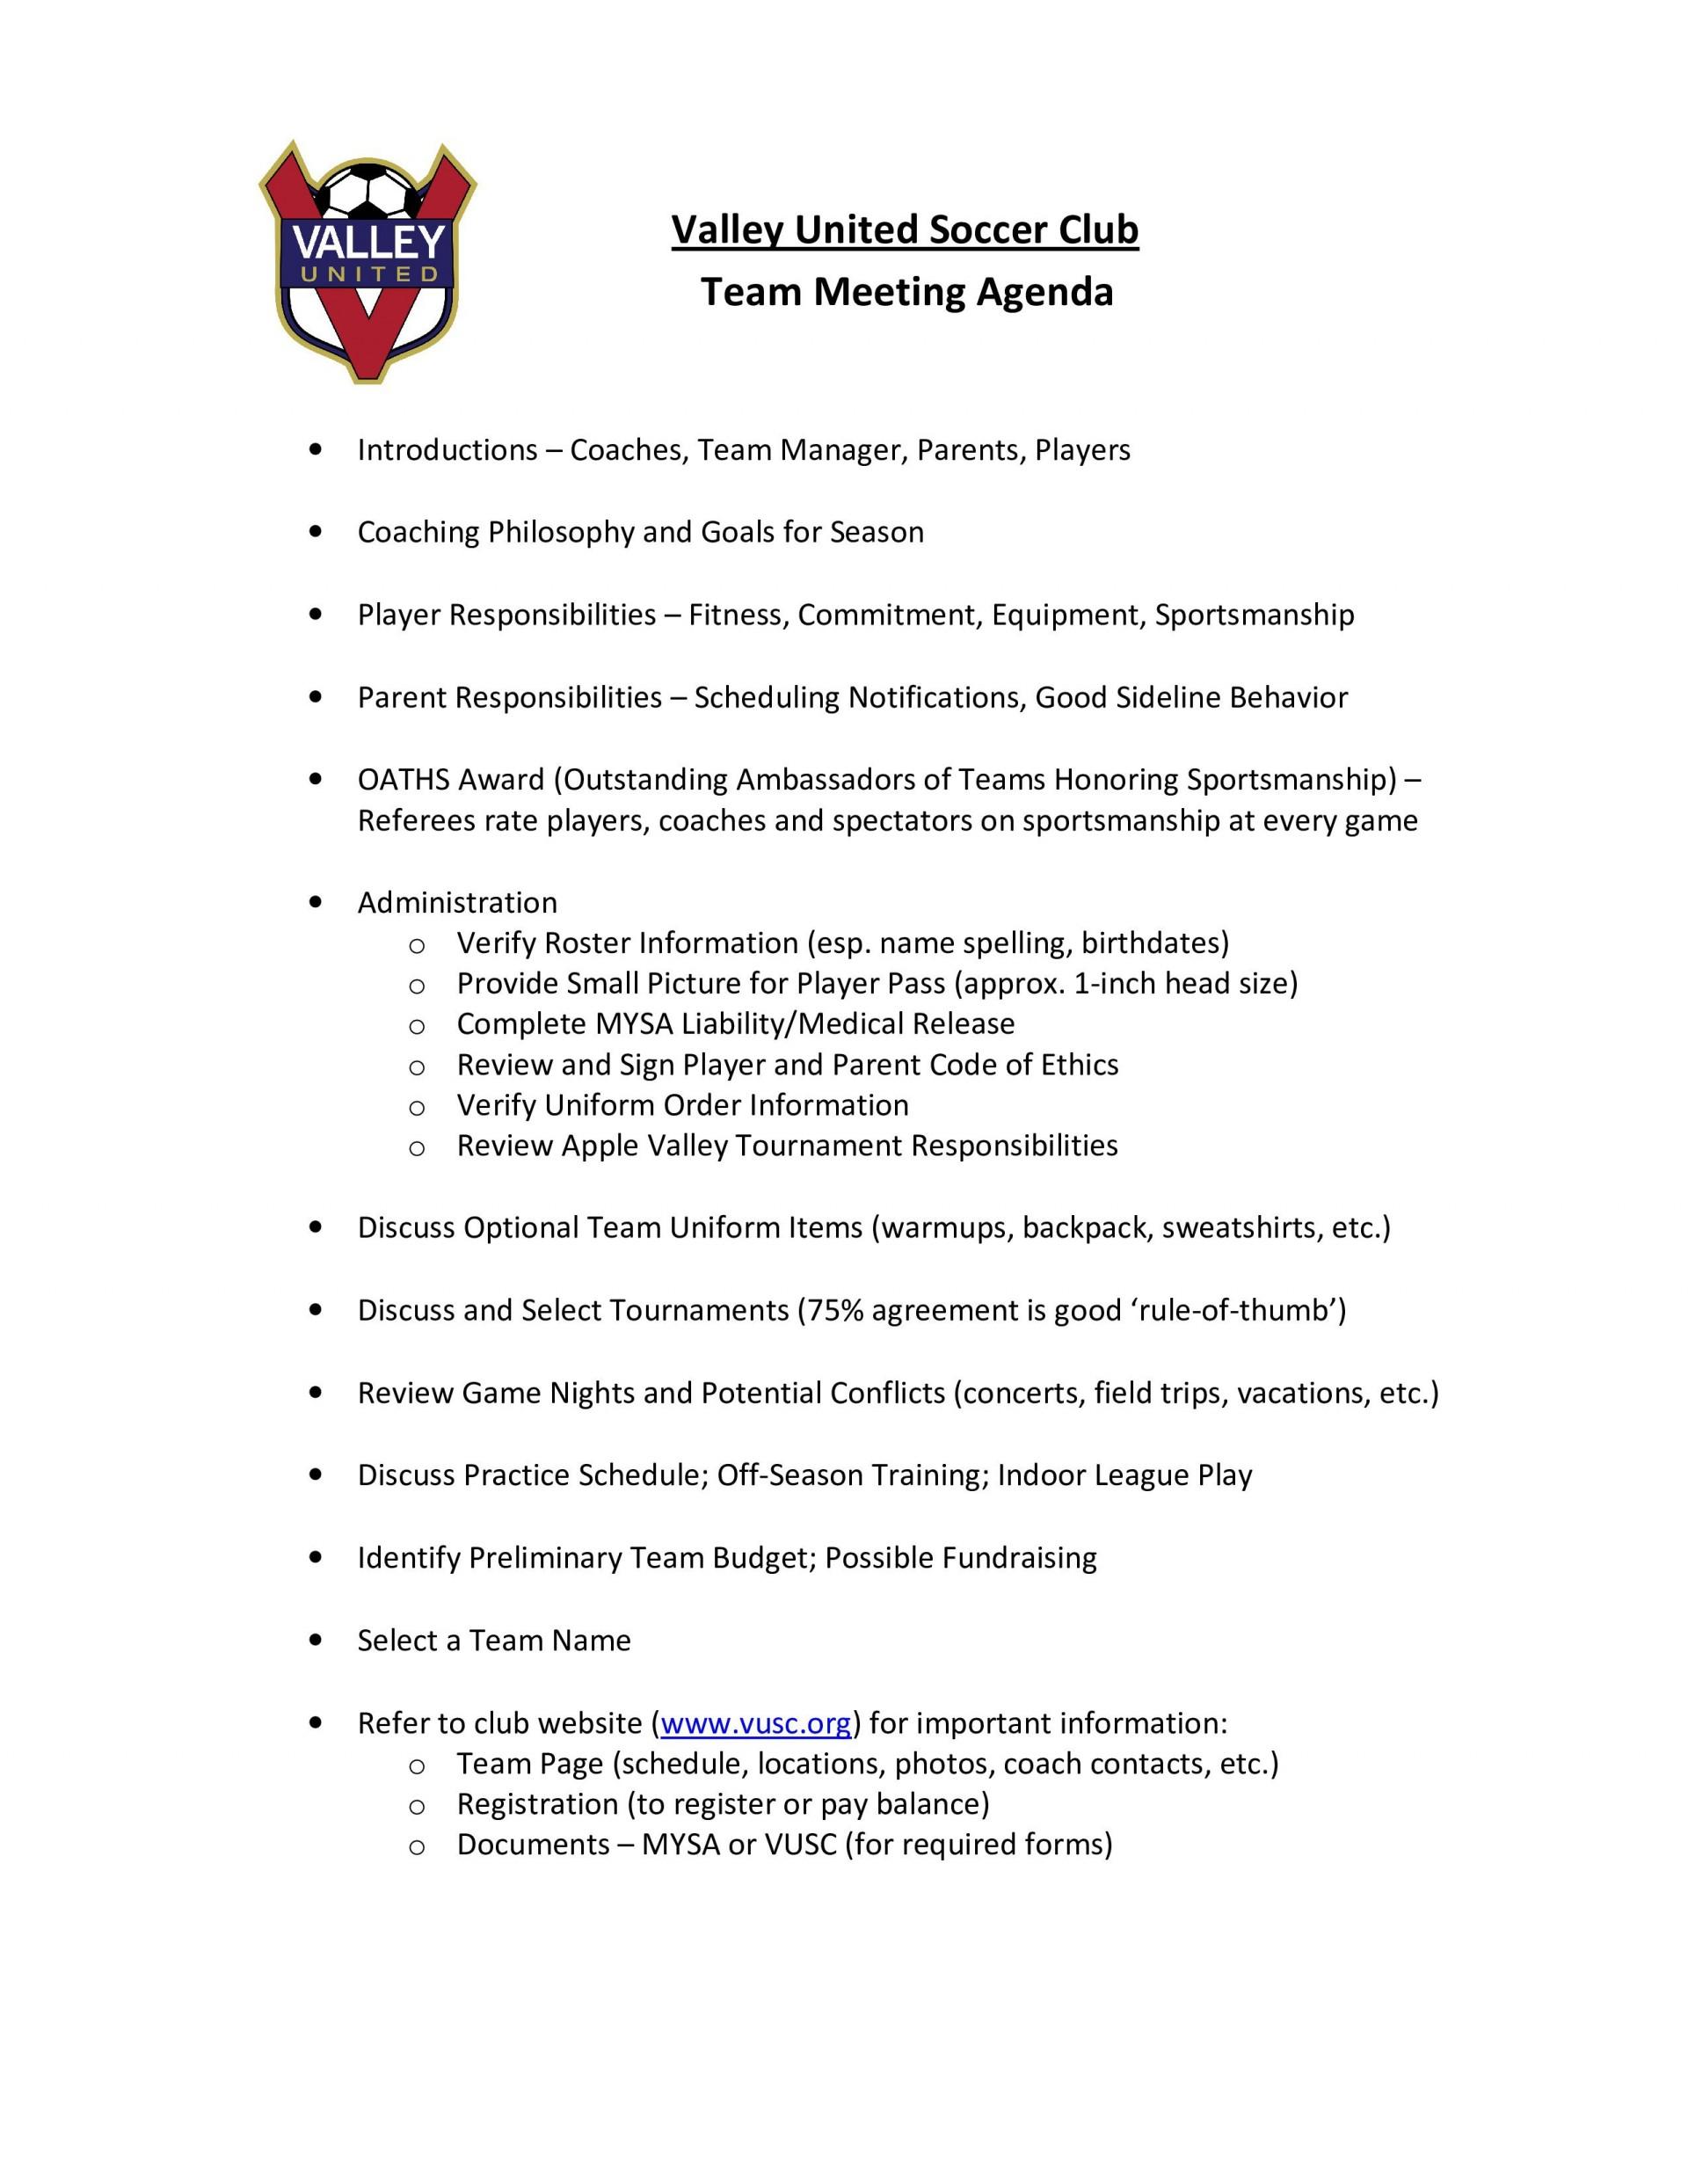 001 Wonderful Formal Meeting Agenda Template High Resolution  Board Example Pdf1920